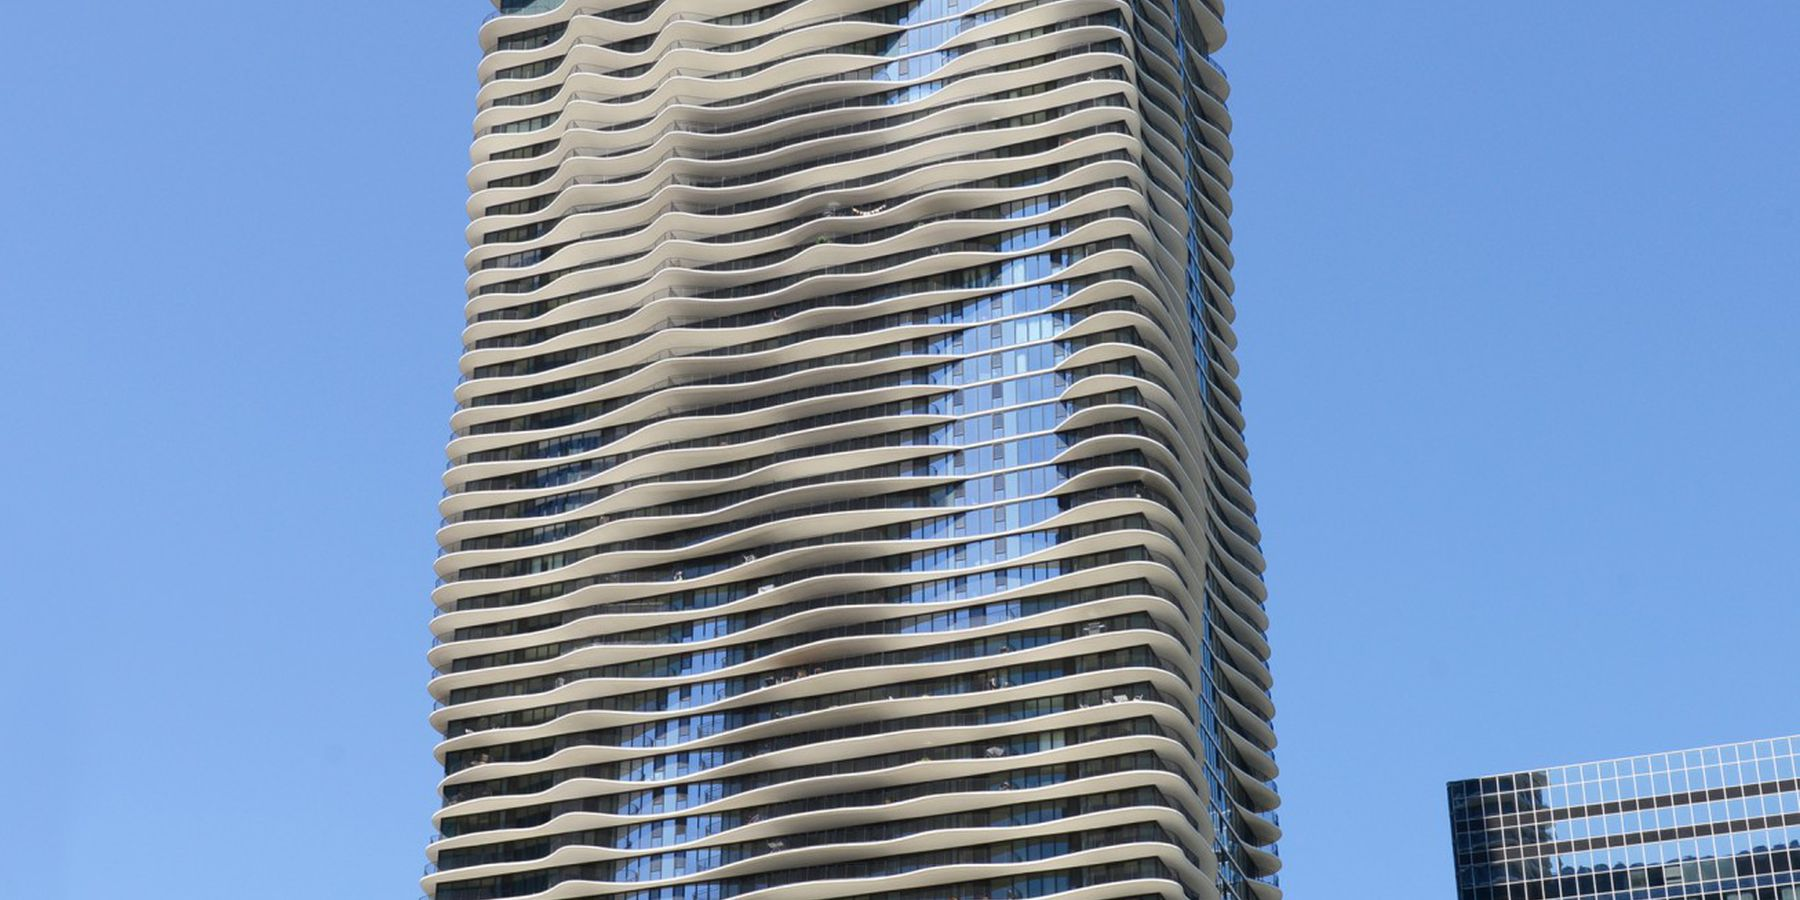 Aqua tower - Chicago - Illinois - Doets Reizen